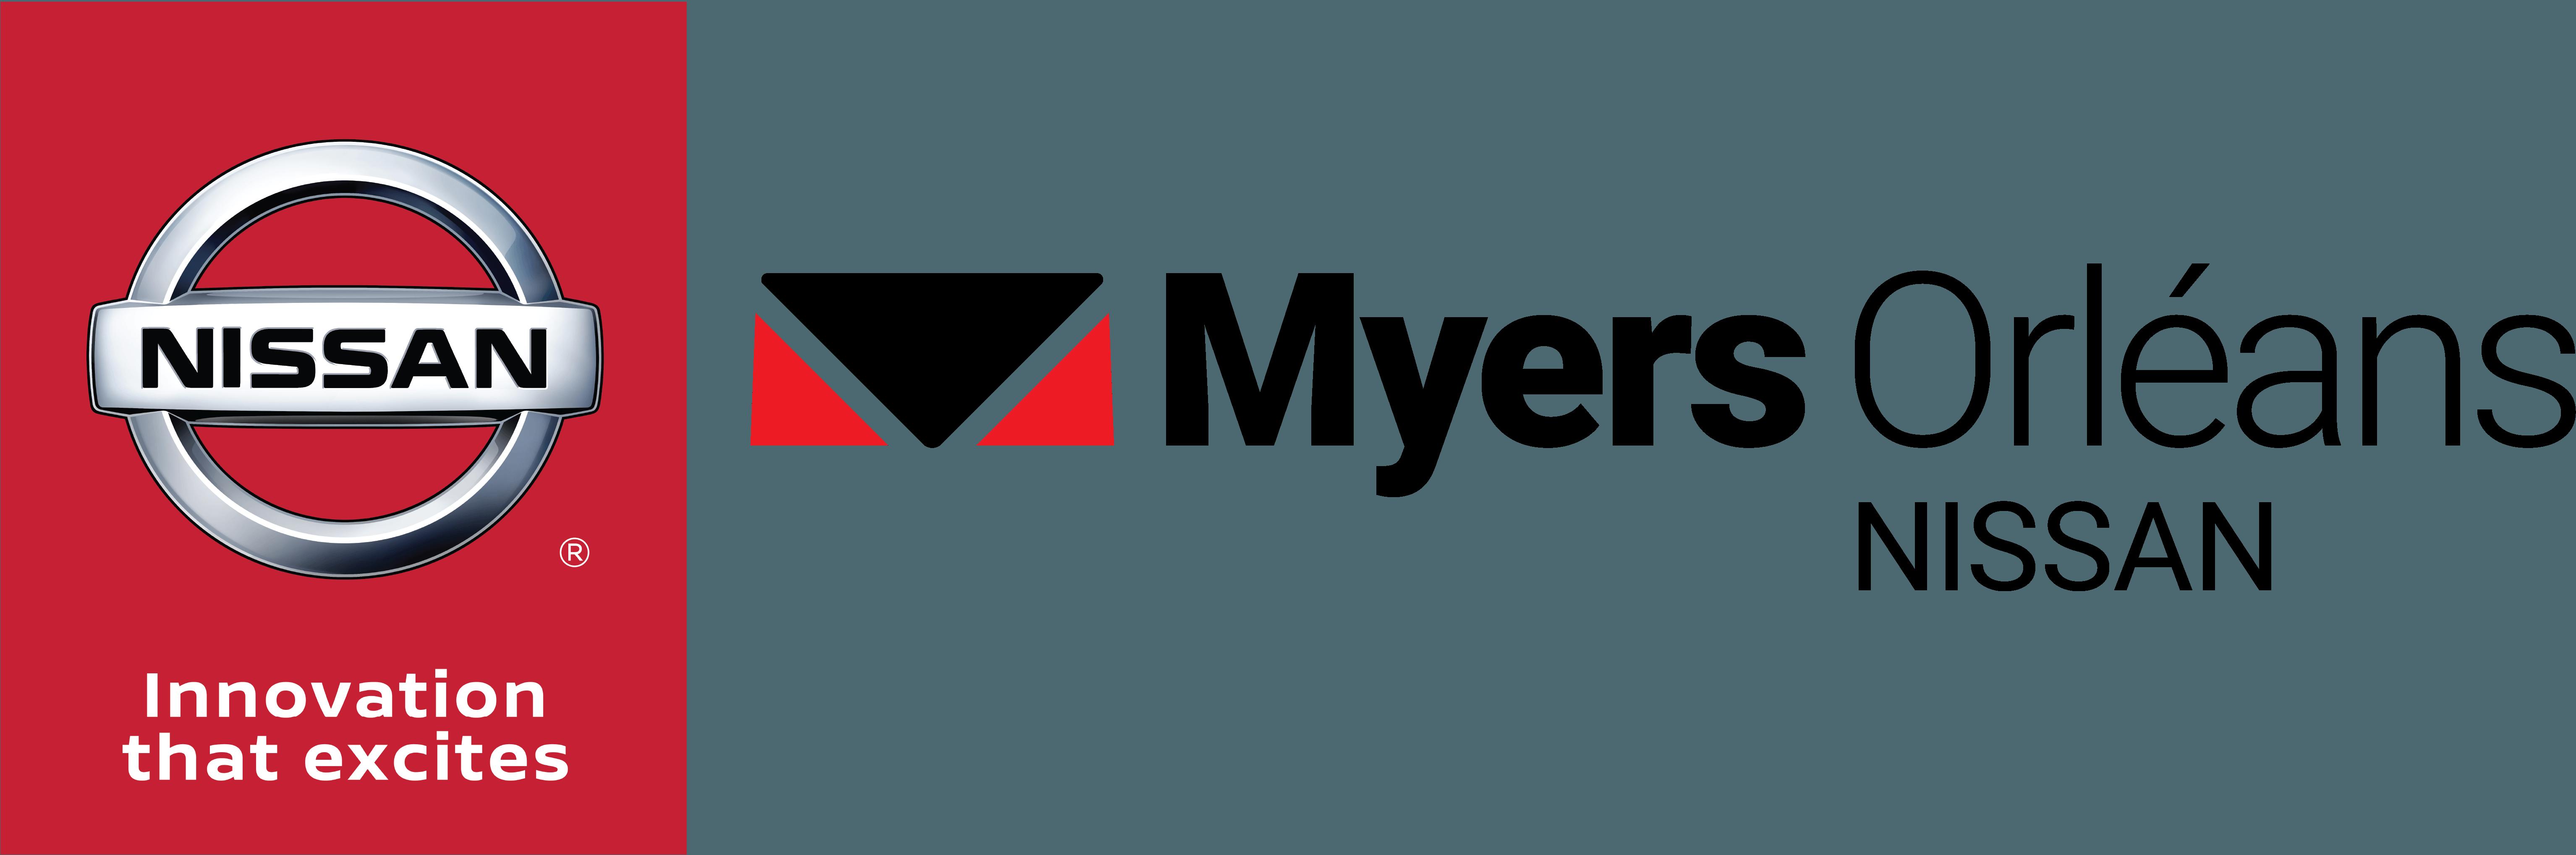 Myers_Orlèans_NISSAN.png